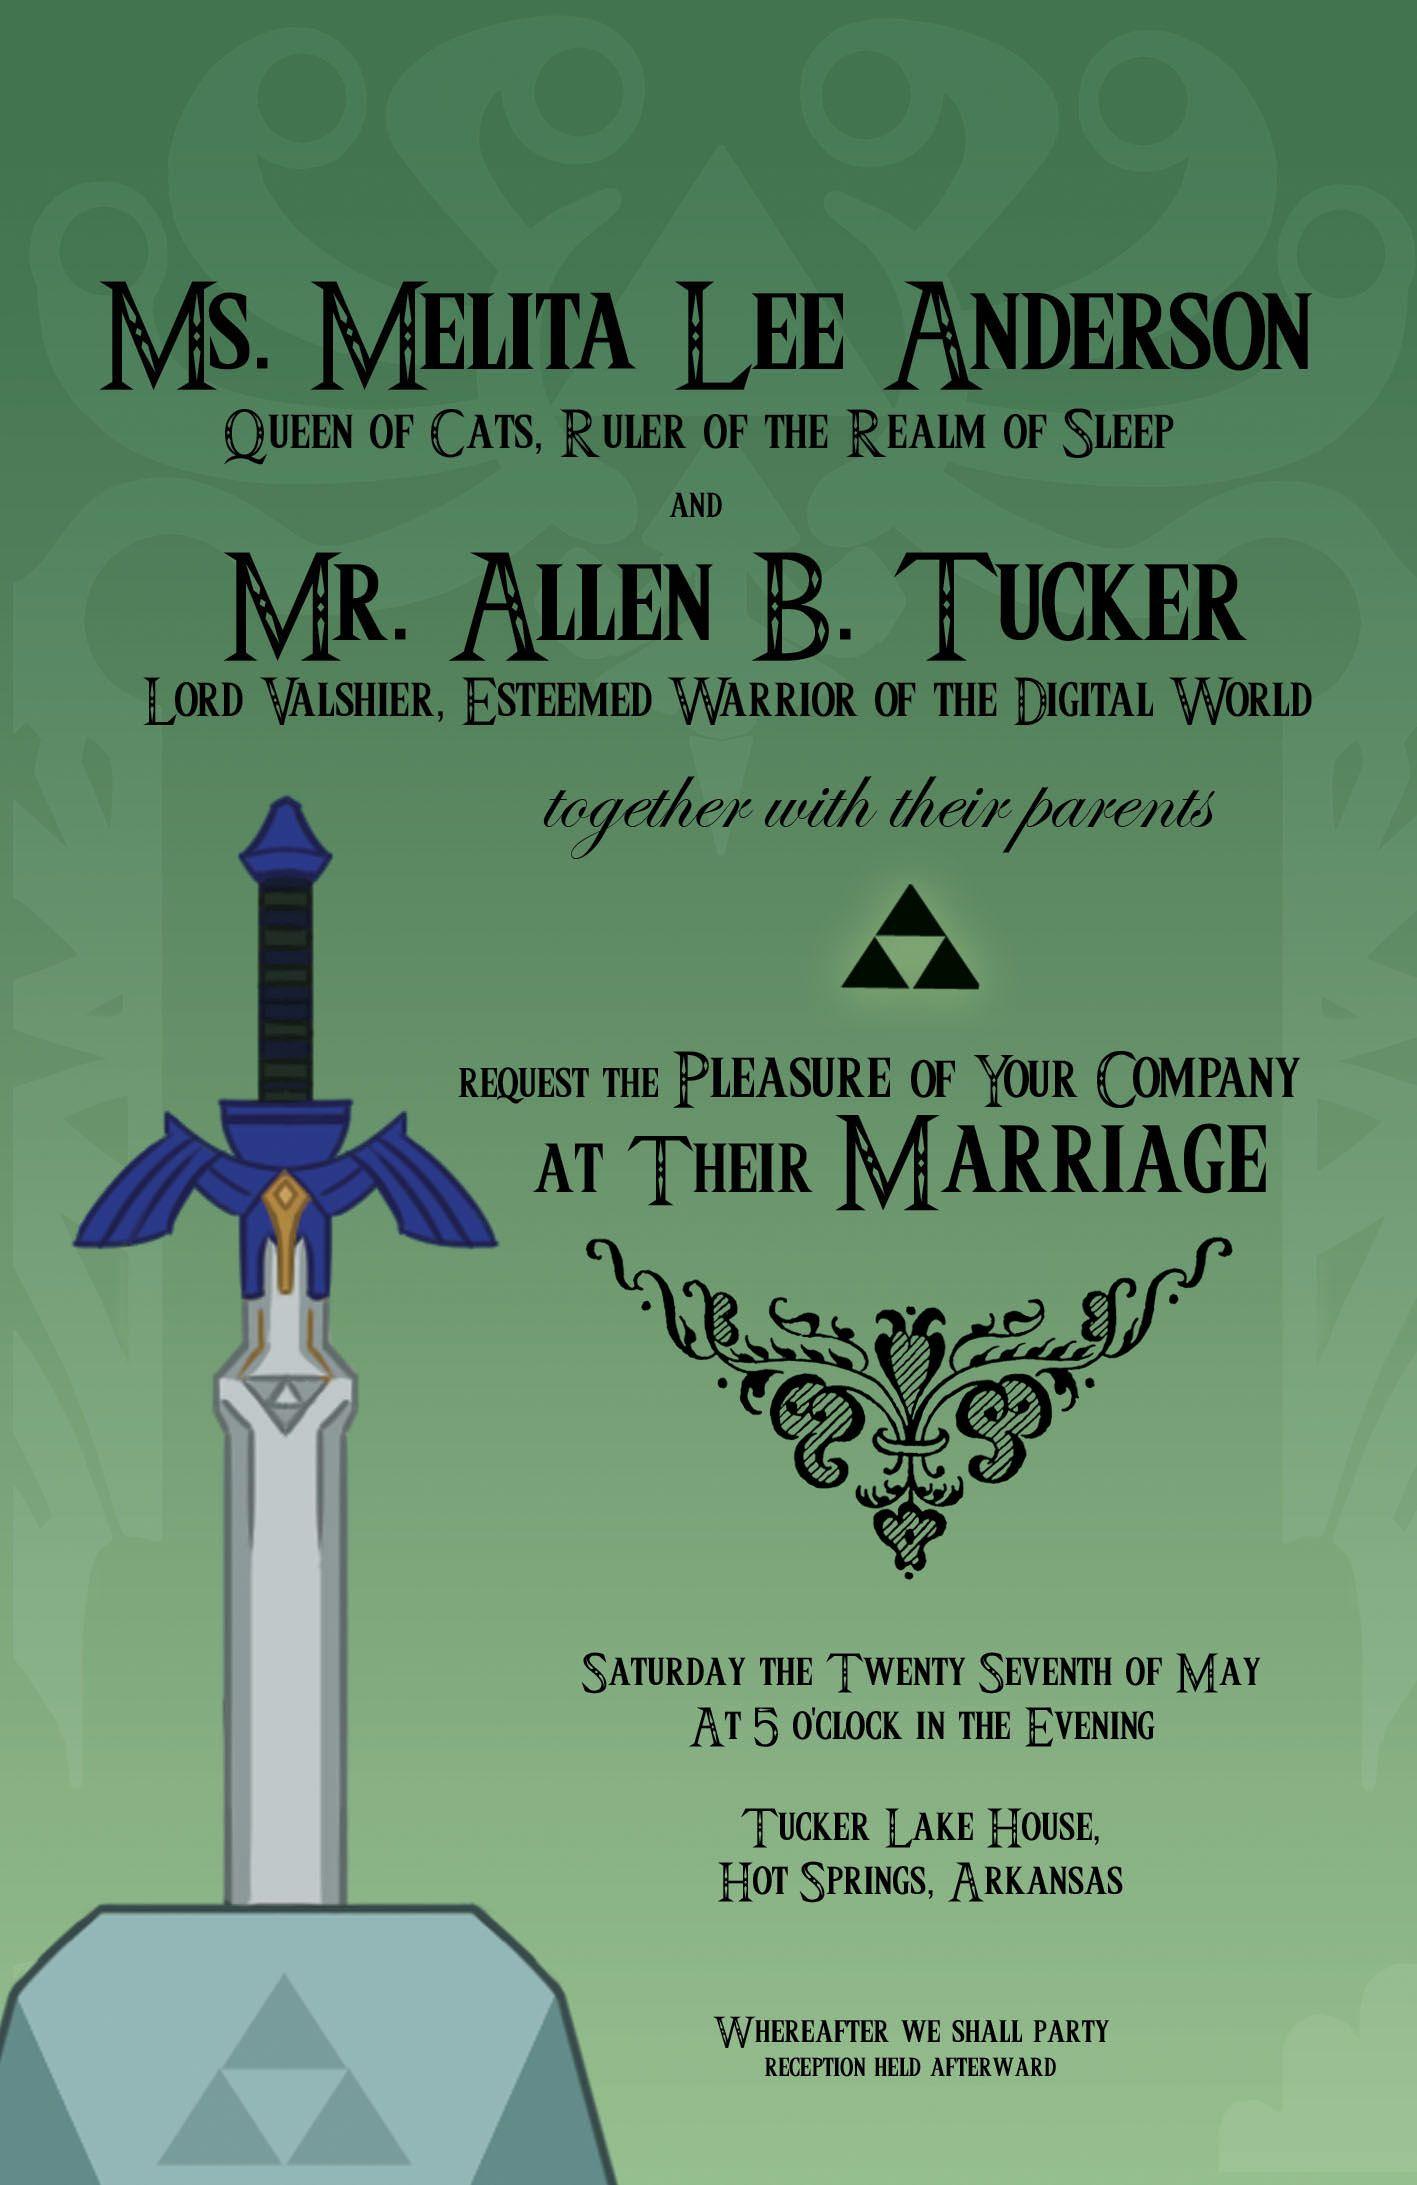 Legend Of Zelda Wedding Invitations Home Free Printable Birthday